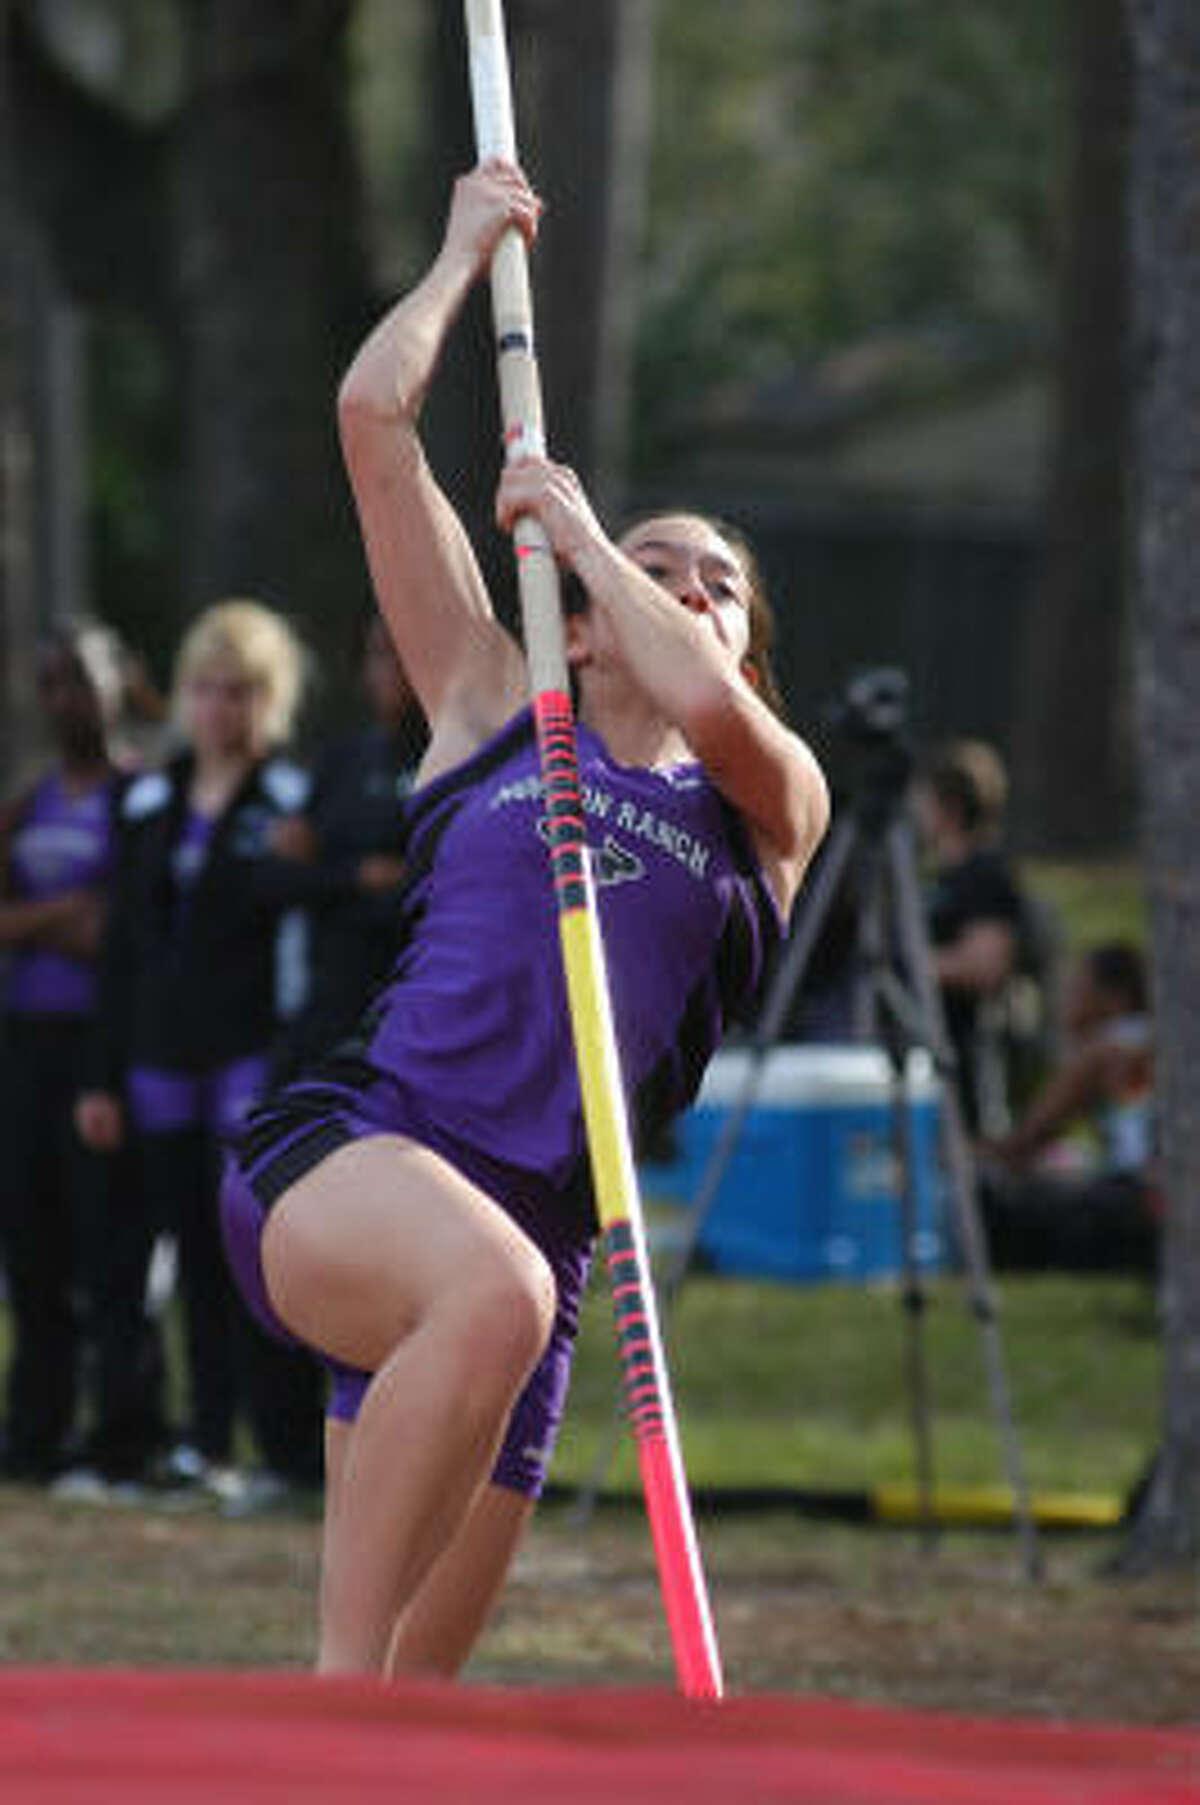 Morton Ranch's Meagan Burciaga was third in girls pole vault.